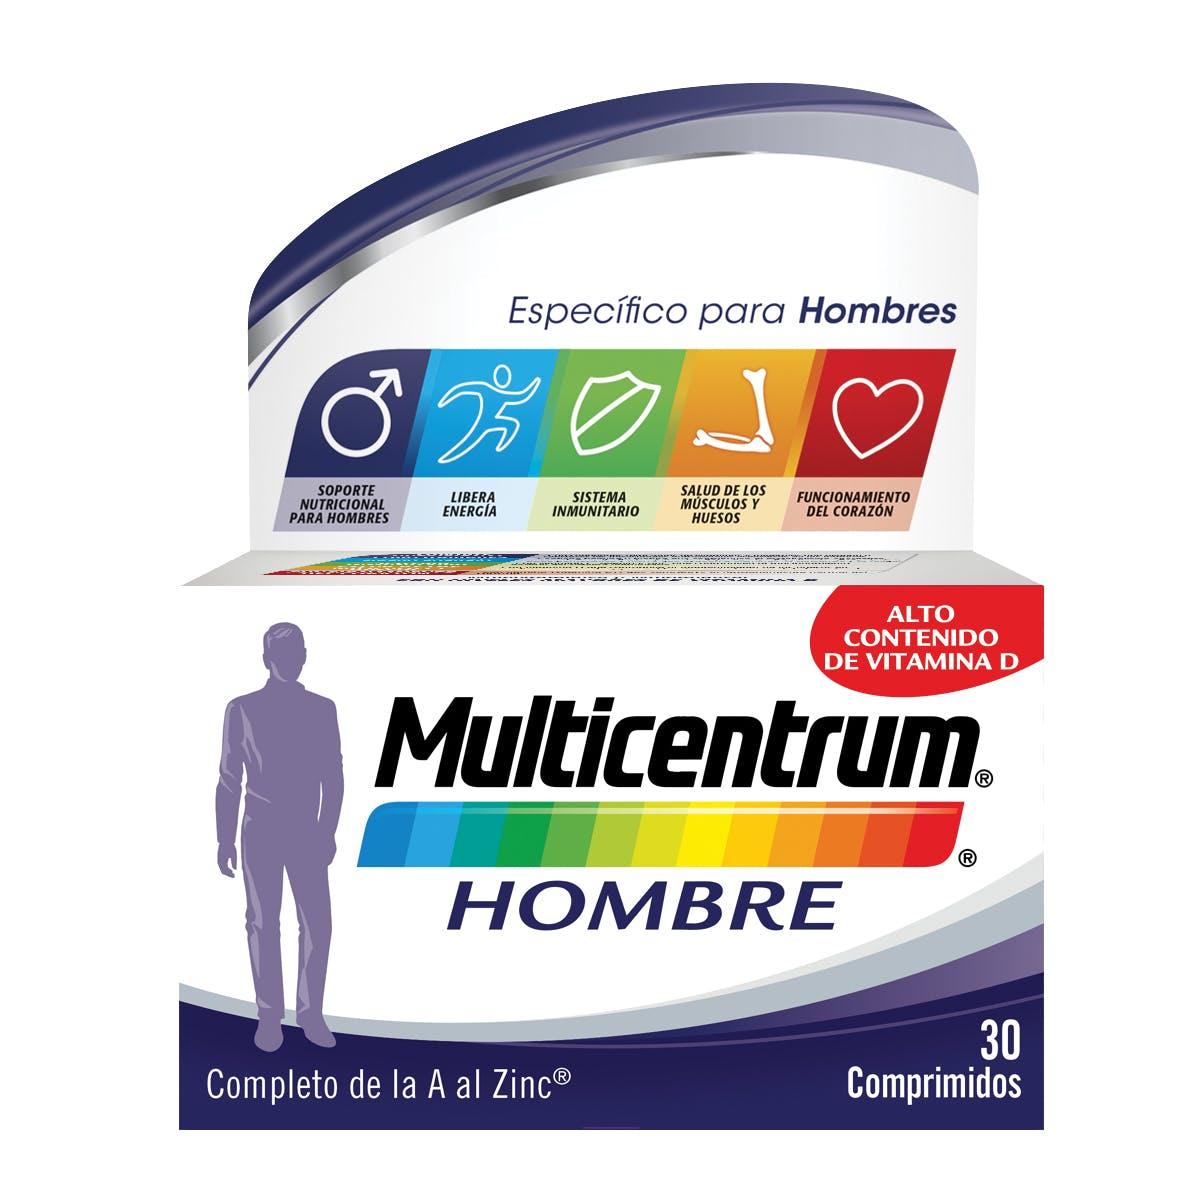 Bote Multivitaminas para Hombre - Multicentrum